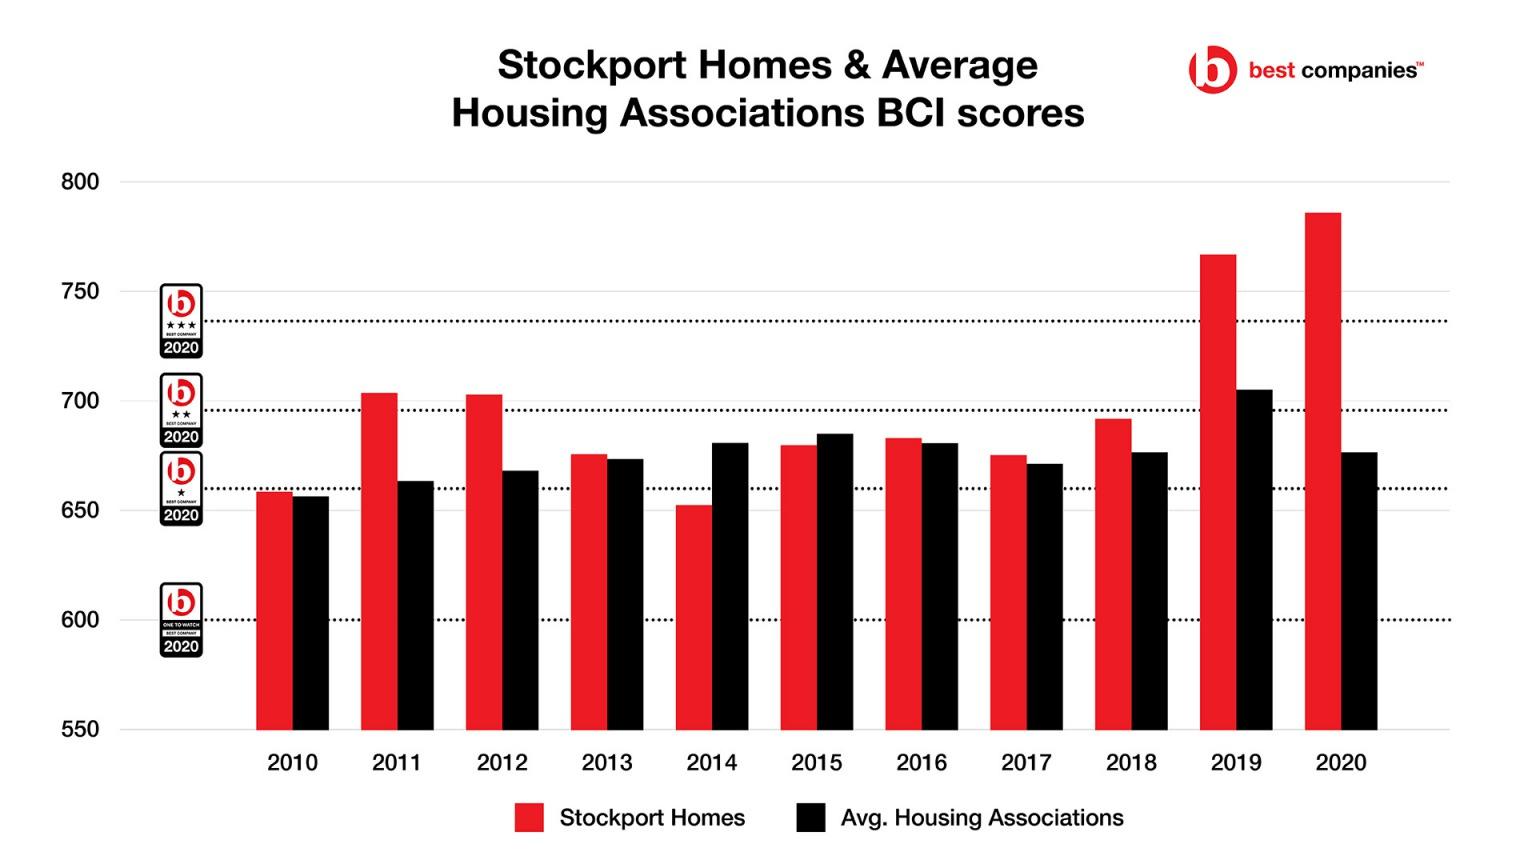 Stockport Homes Engagement Score vs Housing Associaitions (BCI Score Average)